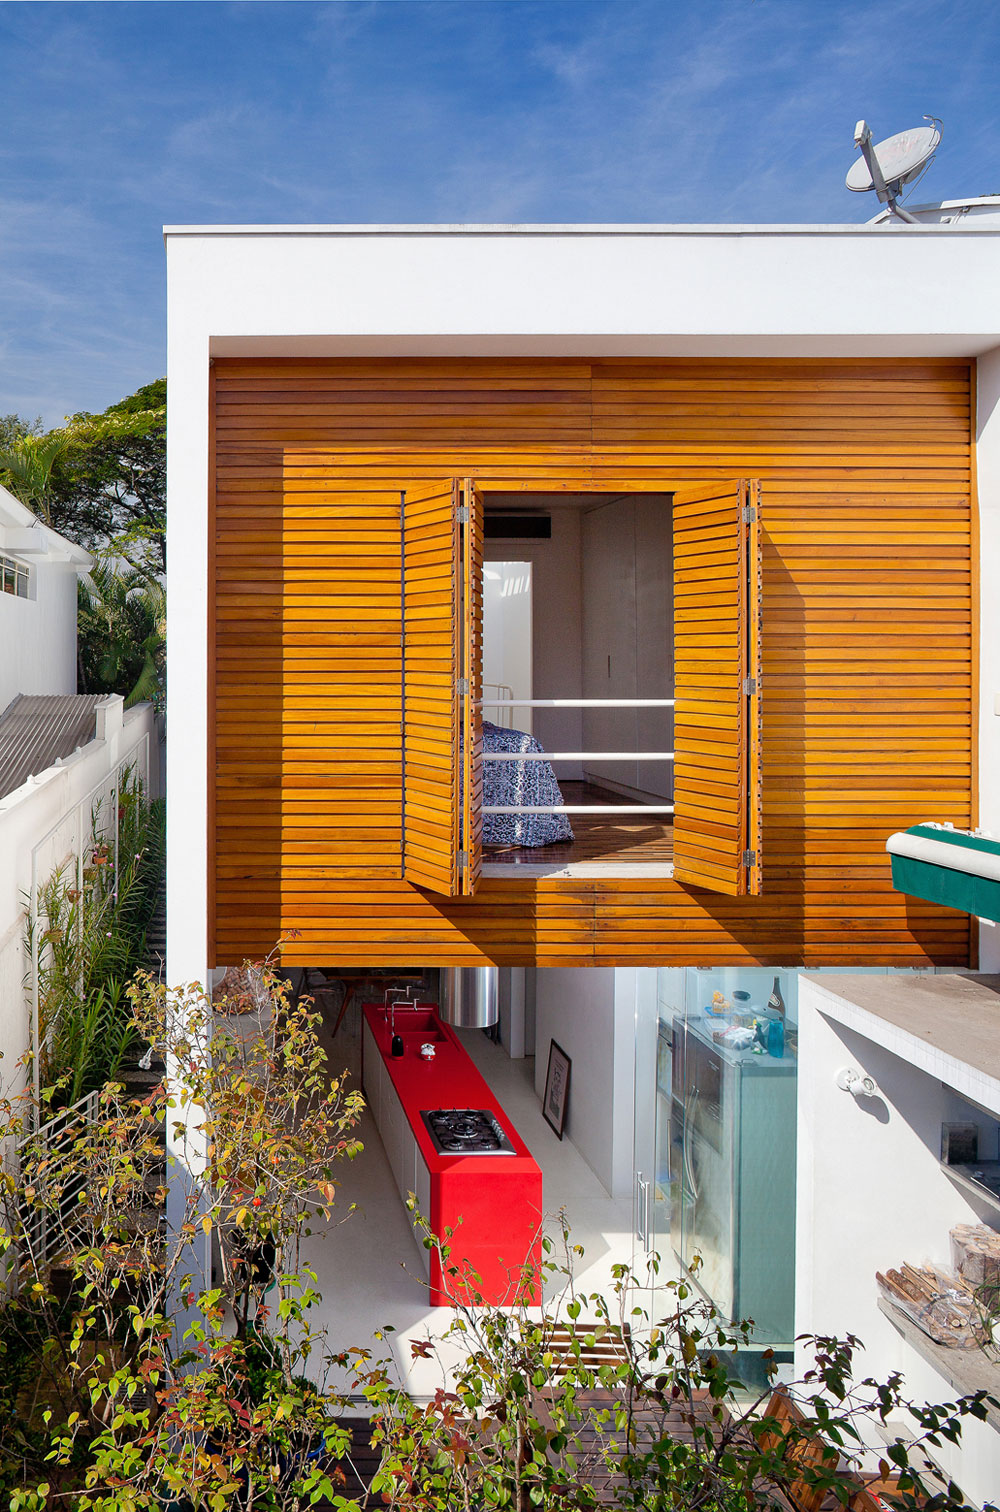 Brooklin House by Galeria Arquitetos (3)